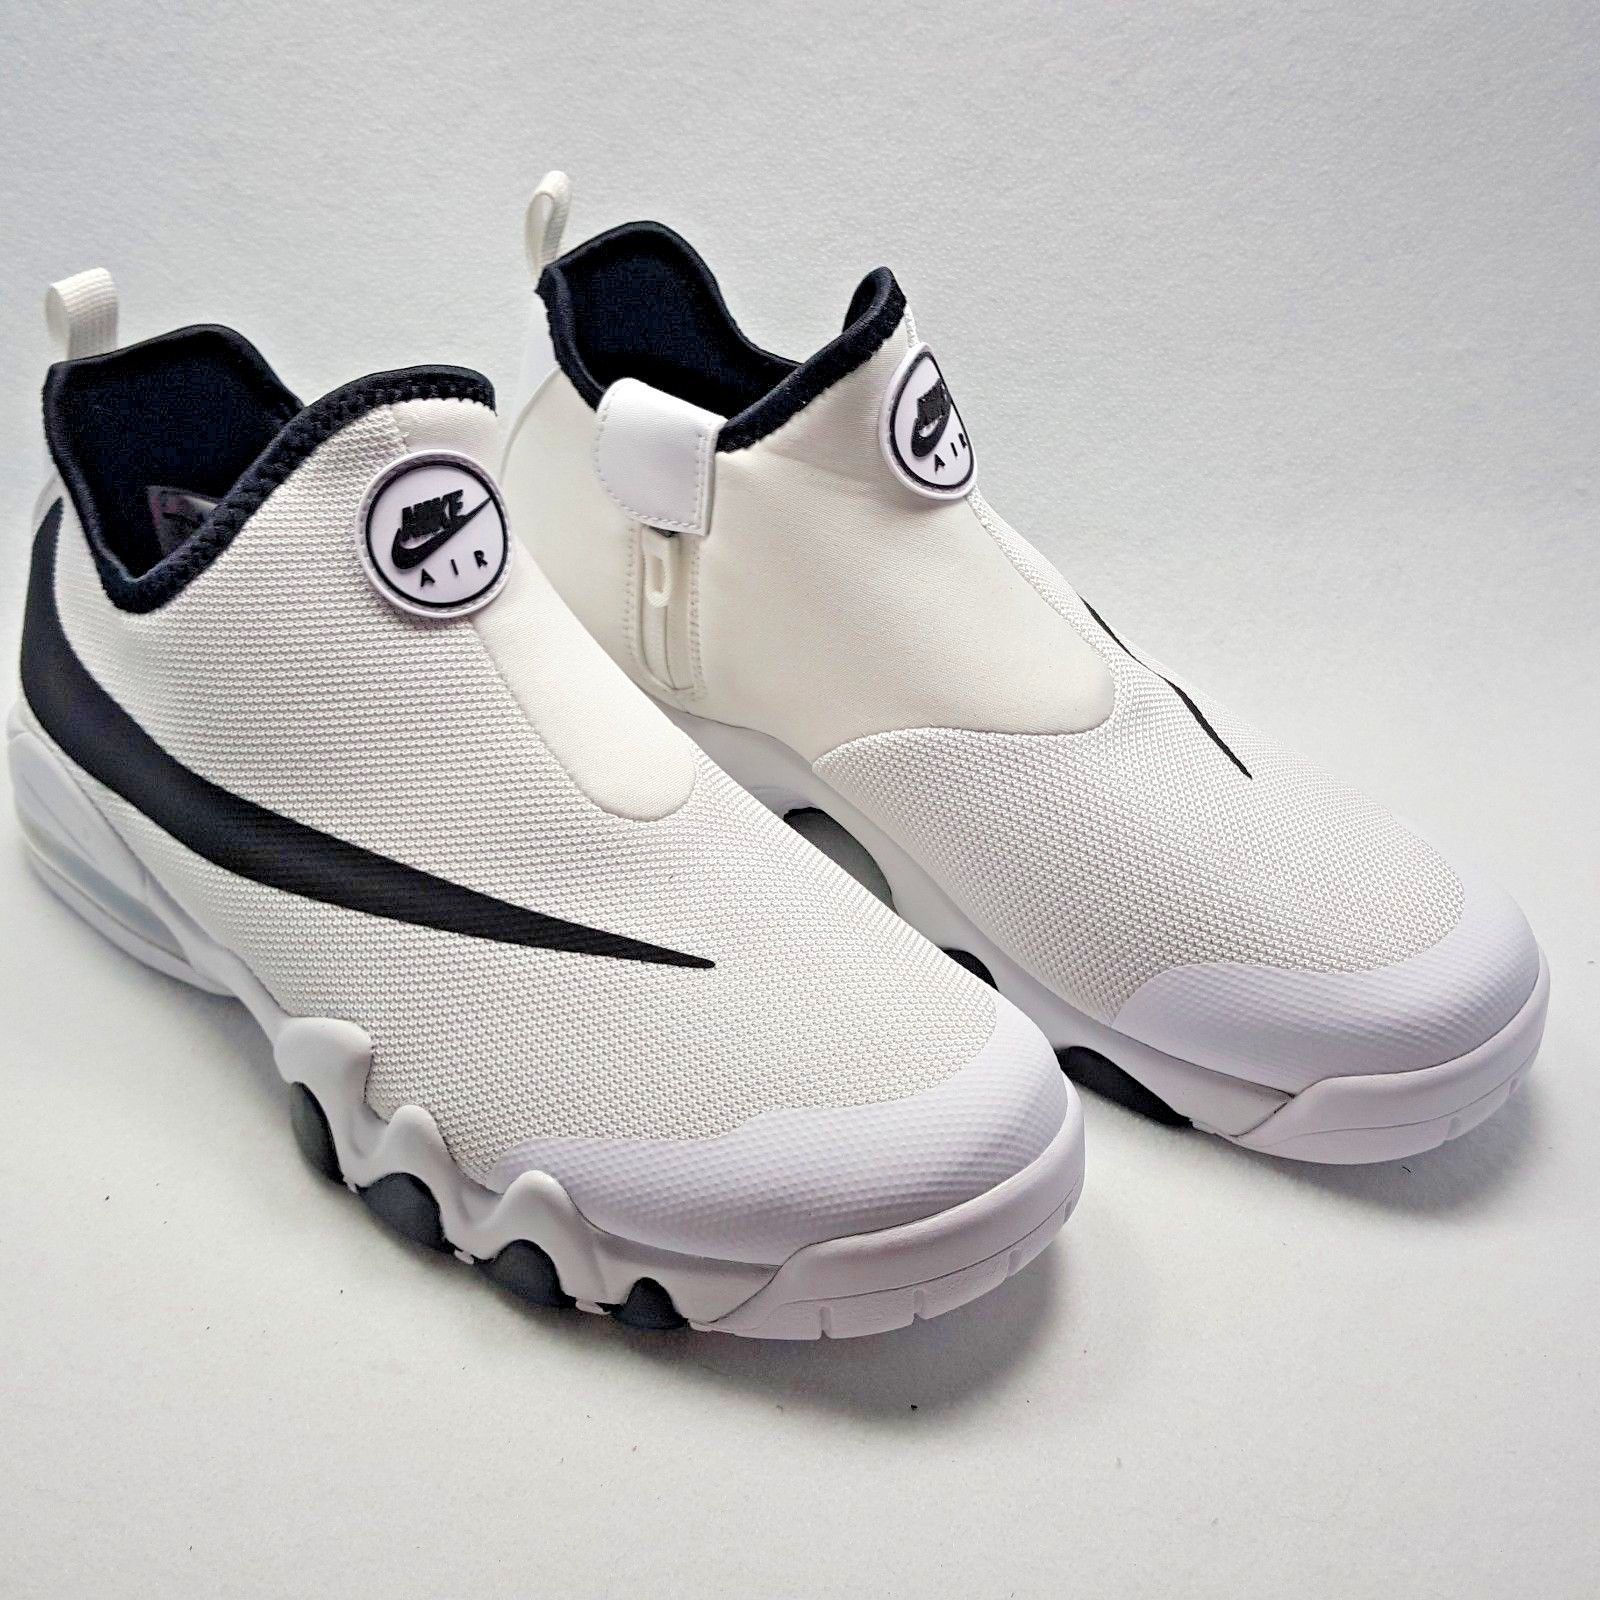 new styles d5a8e de47b ... purchase nike air max big swoosh charles barkley gary payton white  black shoe men size 12